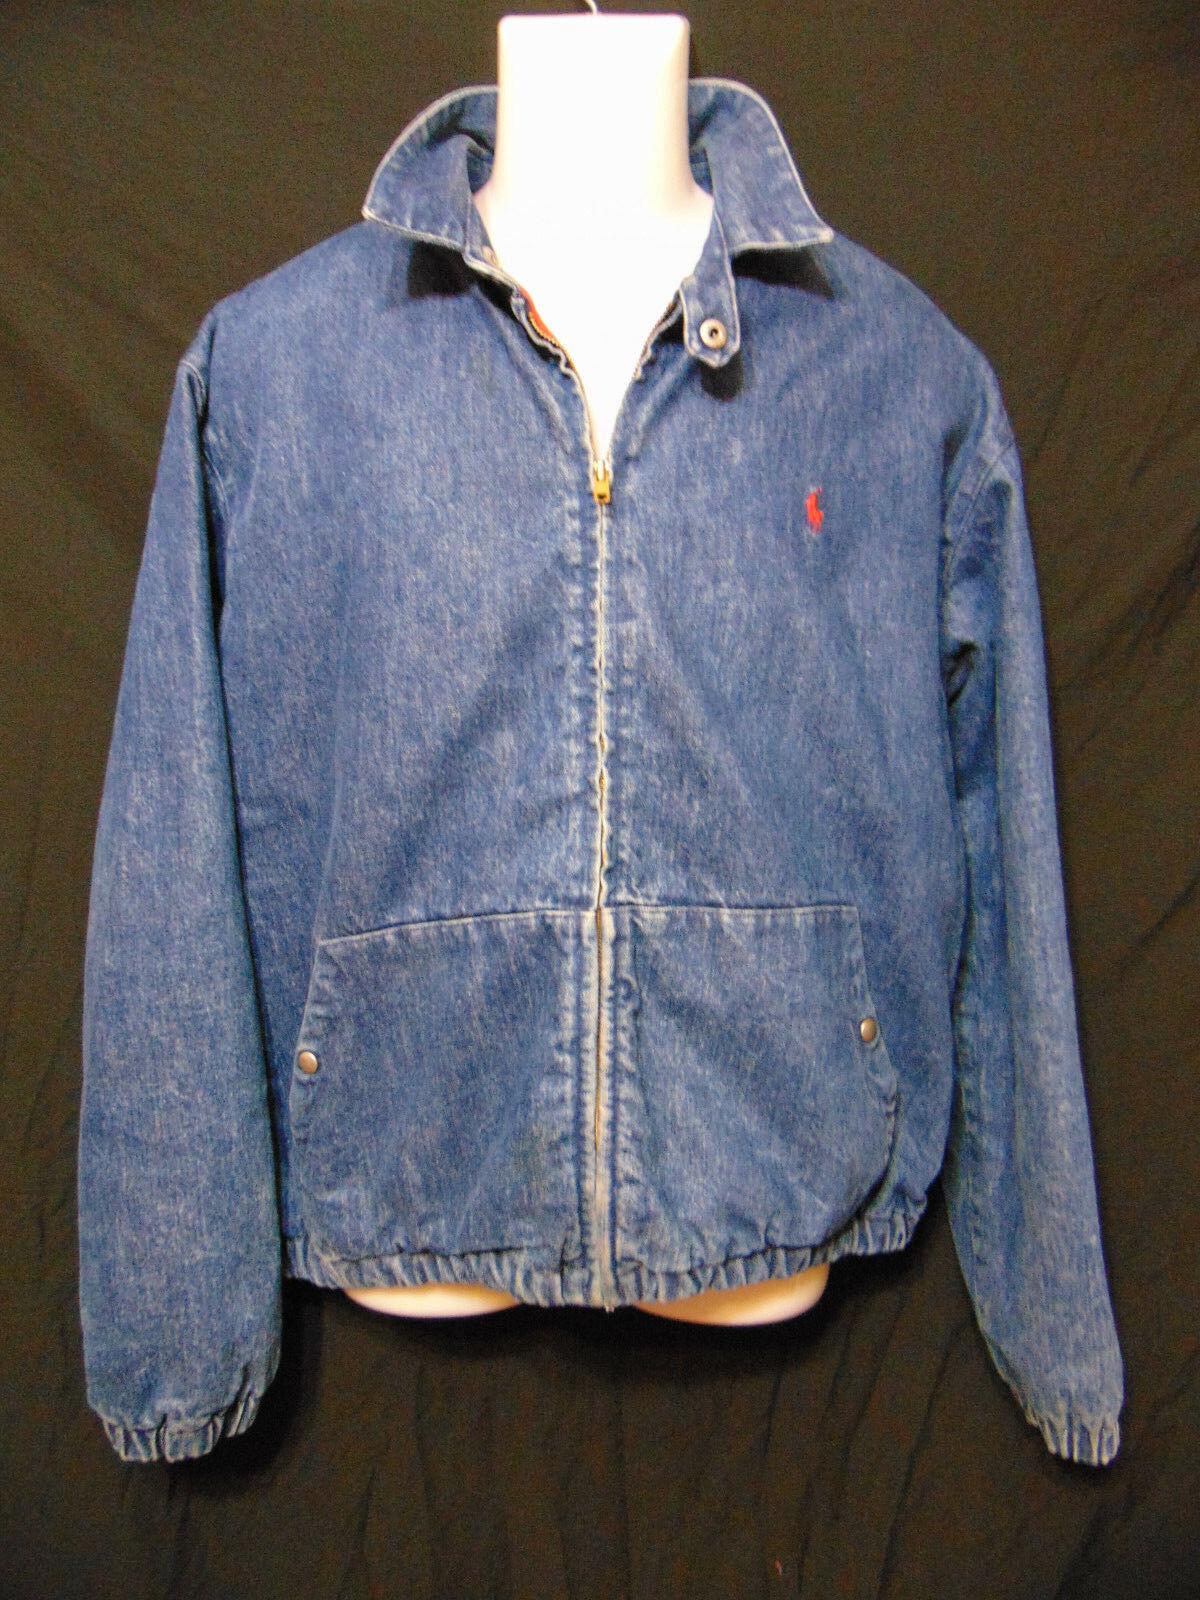 b9ef58fc2 57. 57. Previous. POLO RALPH LAUREN Vintage 80 s Mens Lined Jean Coat Jacket  Medium Full Zip USA